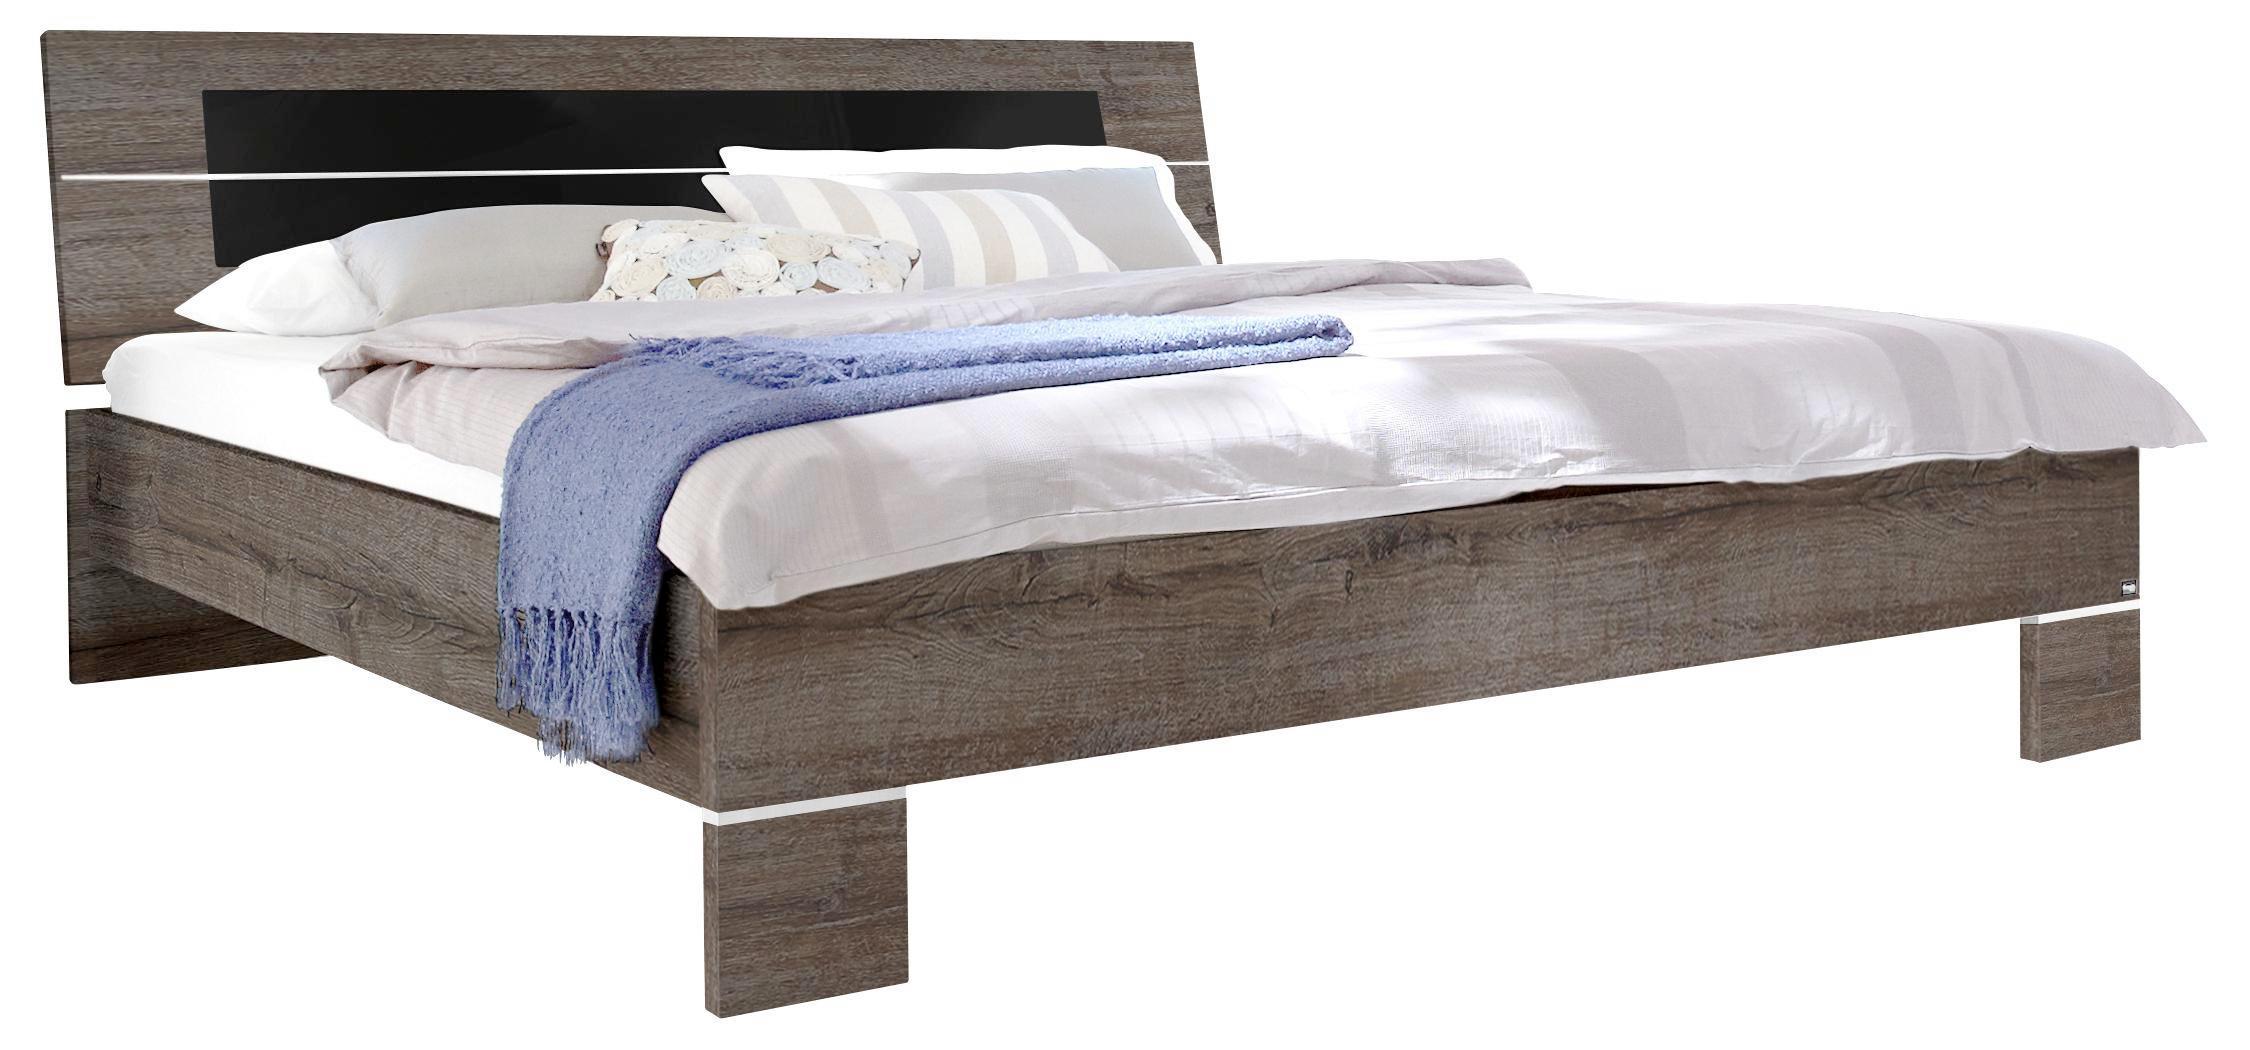 bettrahmen 180x200 excellent bettrahmen 180x200 with. Black Bedroom Furniture Sets. Home Design Ideas